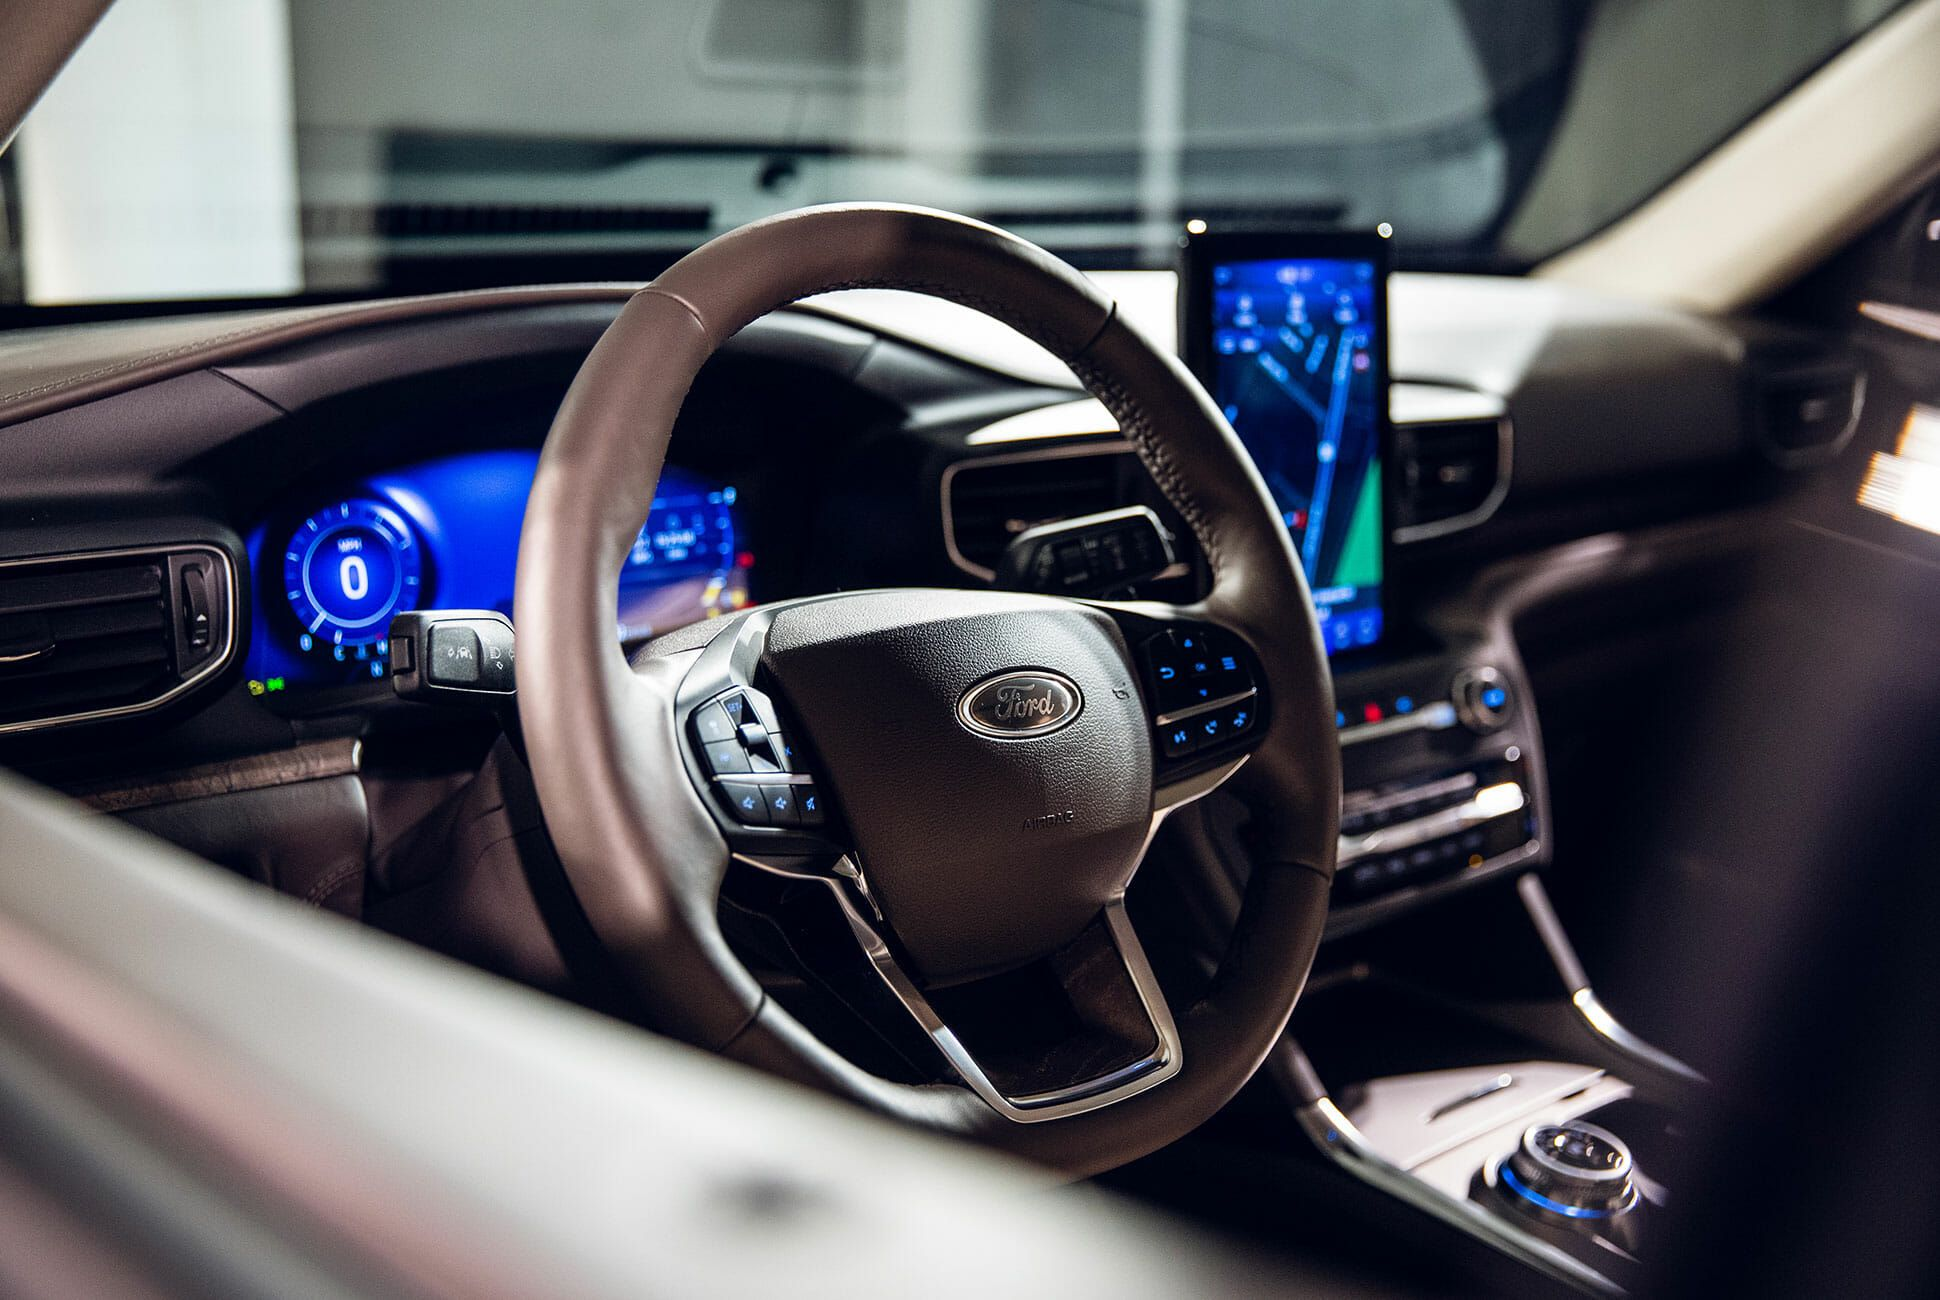 2020-Ford-Explorer-gear-patrol-slide-7